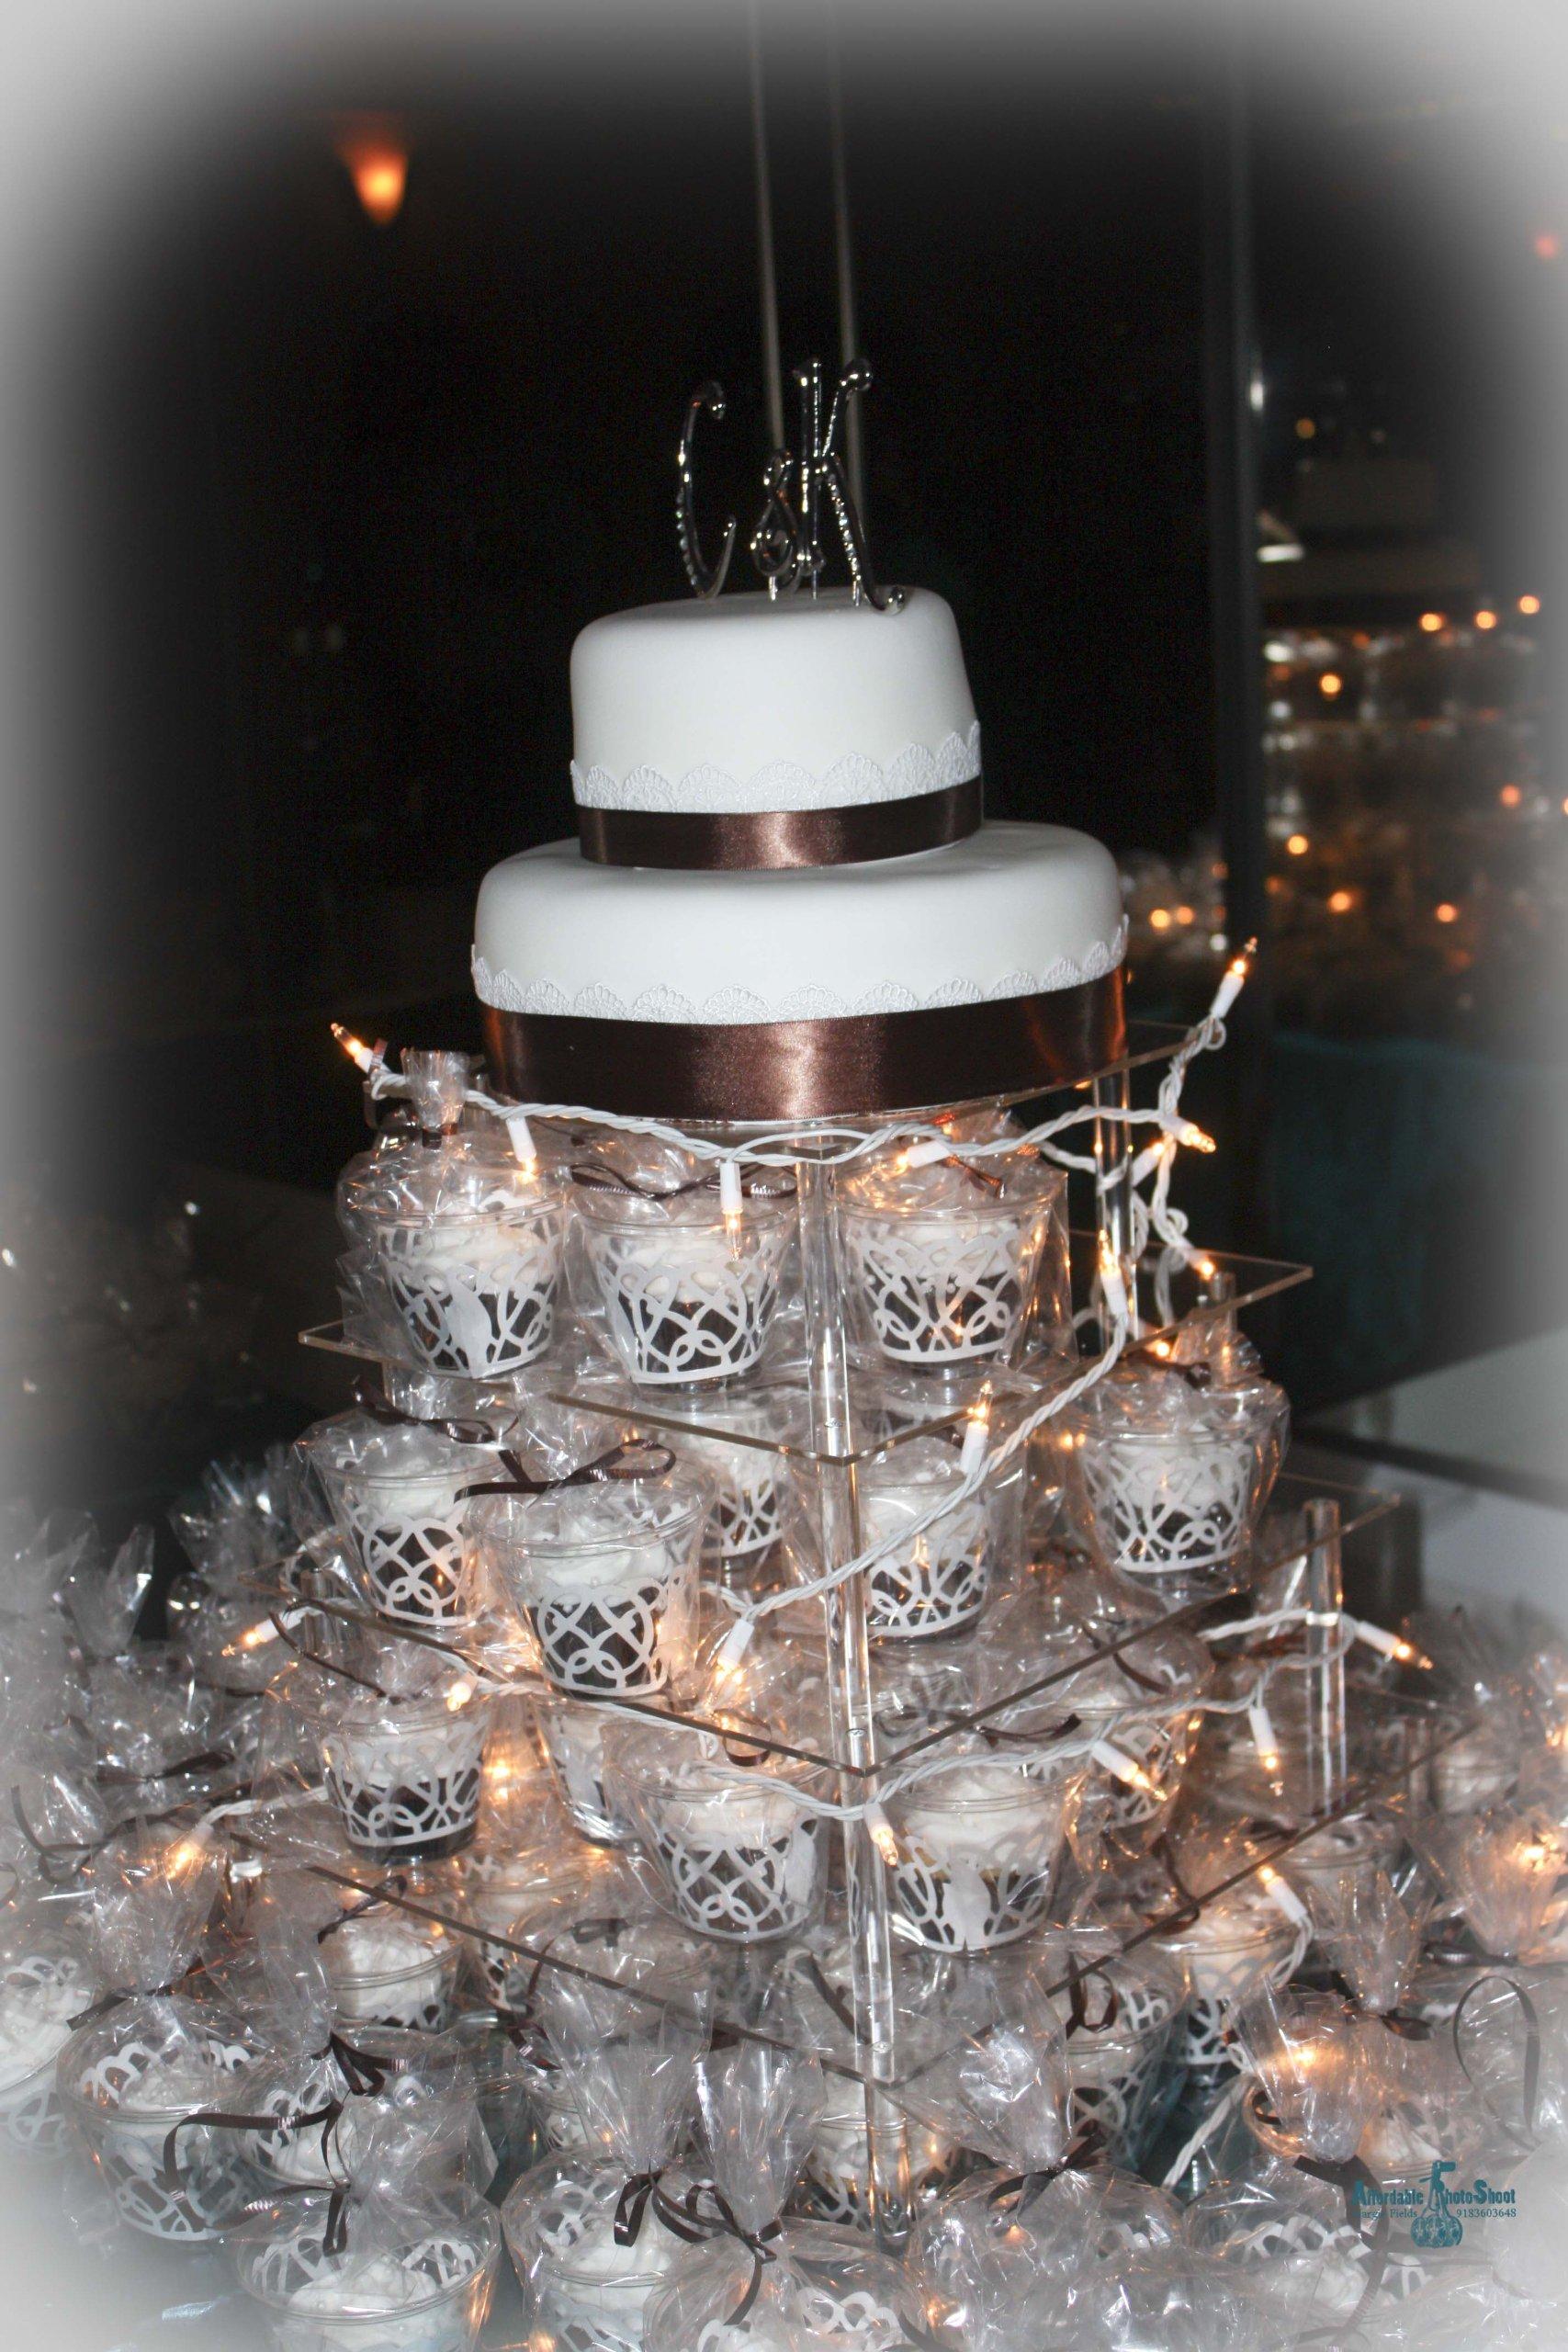 8 Tier Large Square Wedding Acrylic Cupcake Tower Cupcake Stand